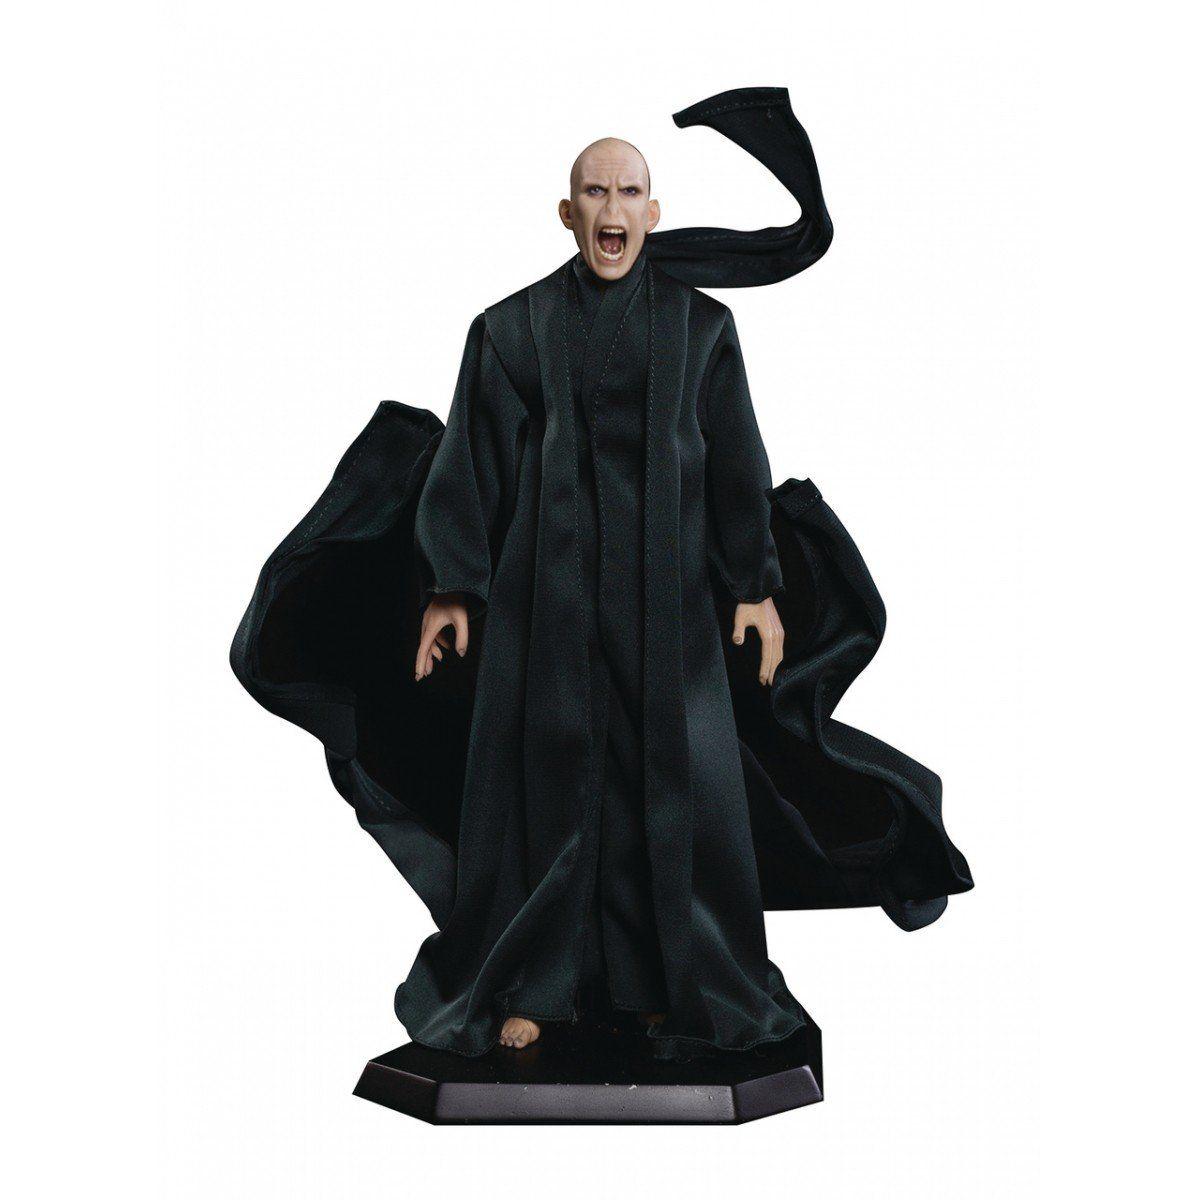 PRÉ VENDA: Boneco Lord Voldemort: Harry Potter e o Cálice de Fogo Escala 1/8 - Star Ace